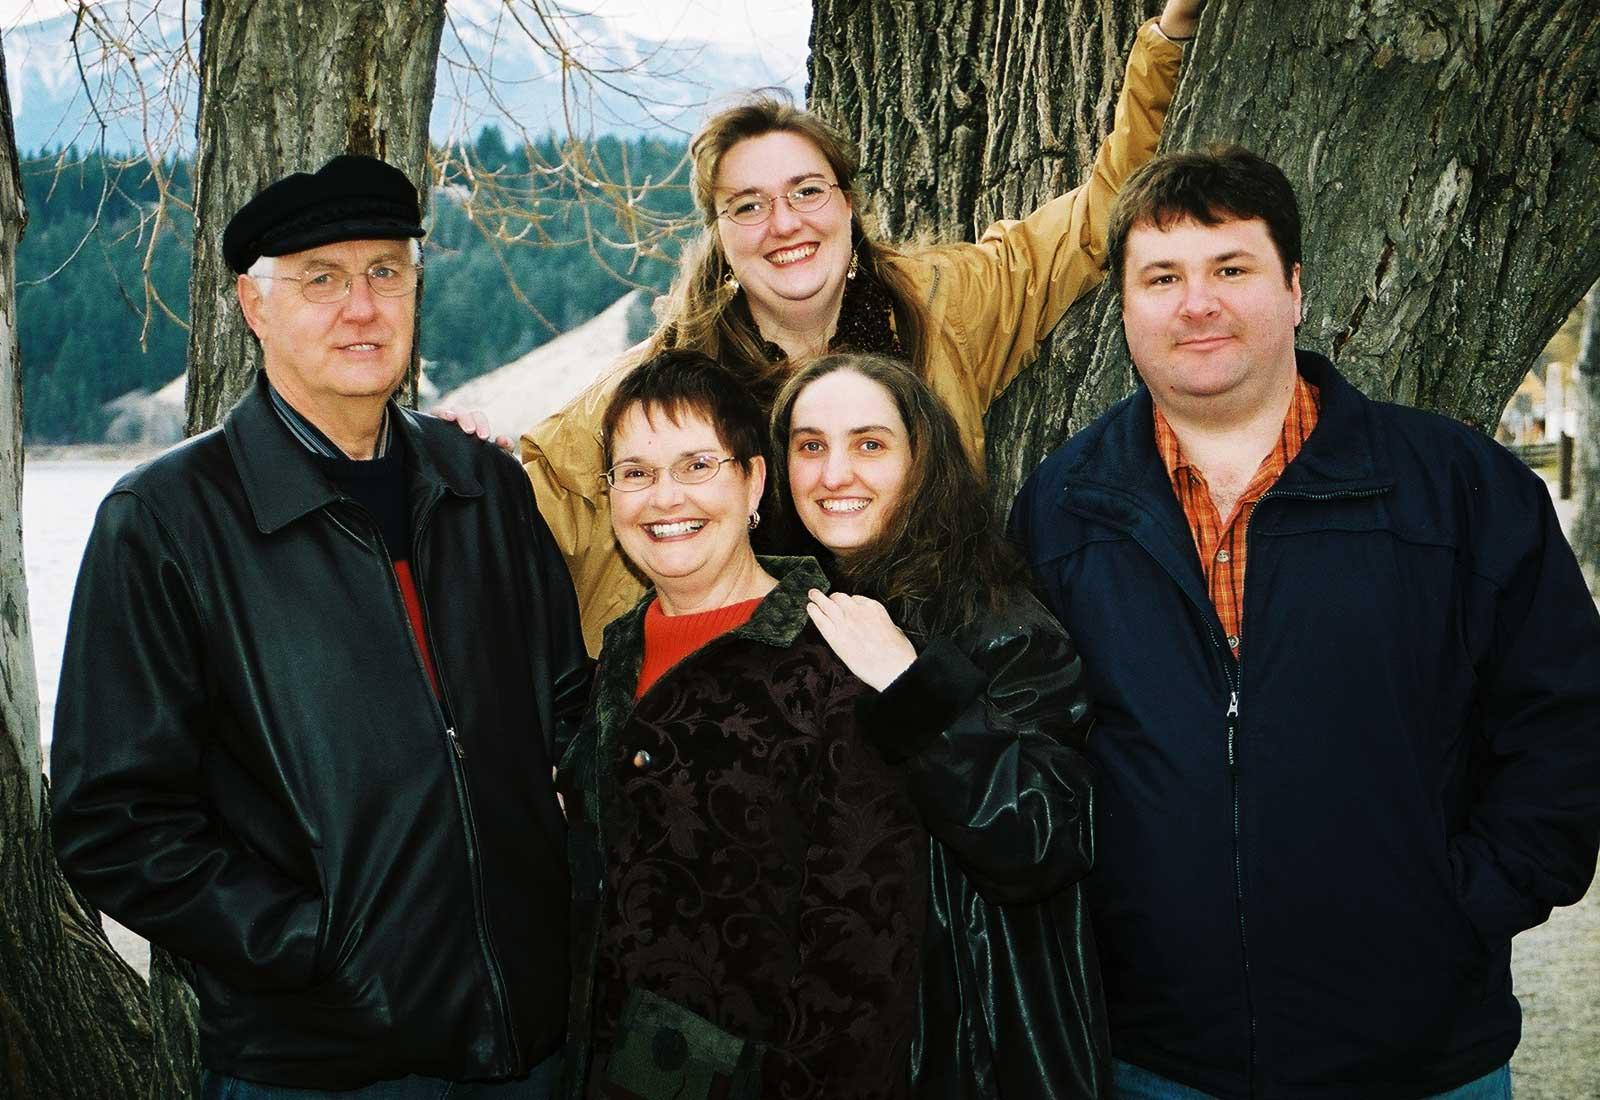 Community Foundation donors - Wittke Family Fund